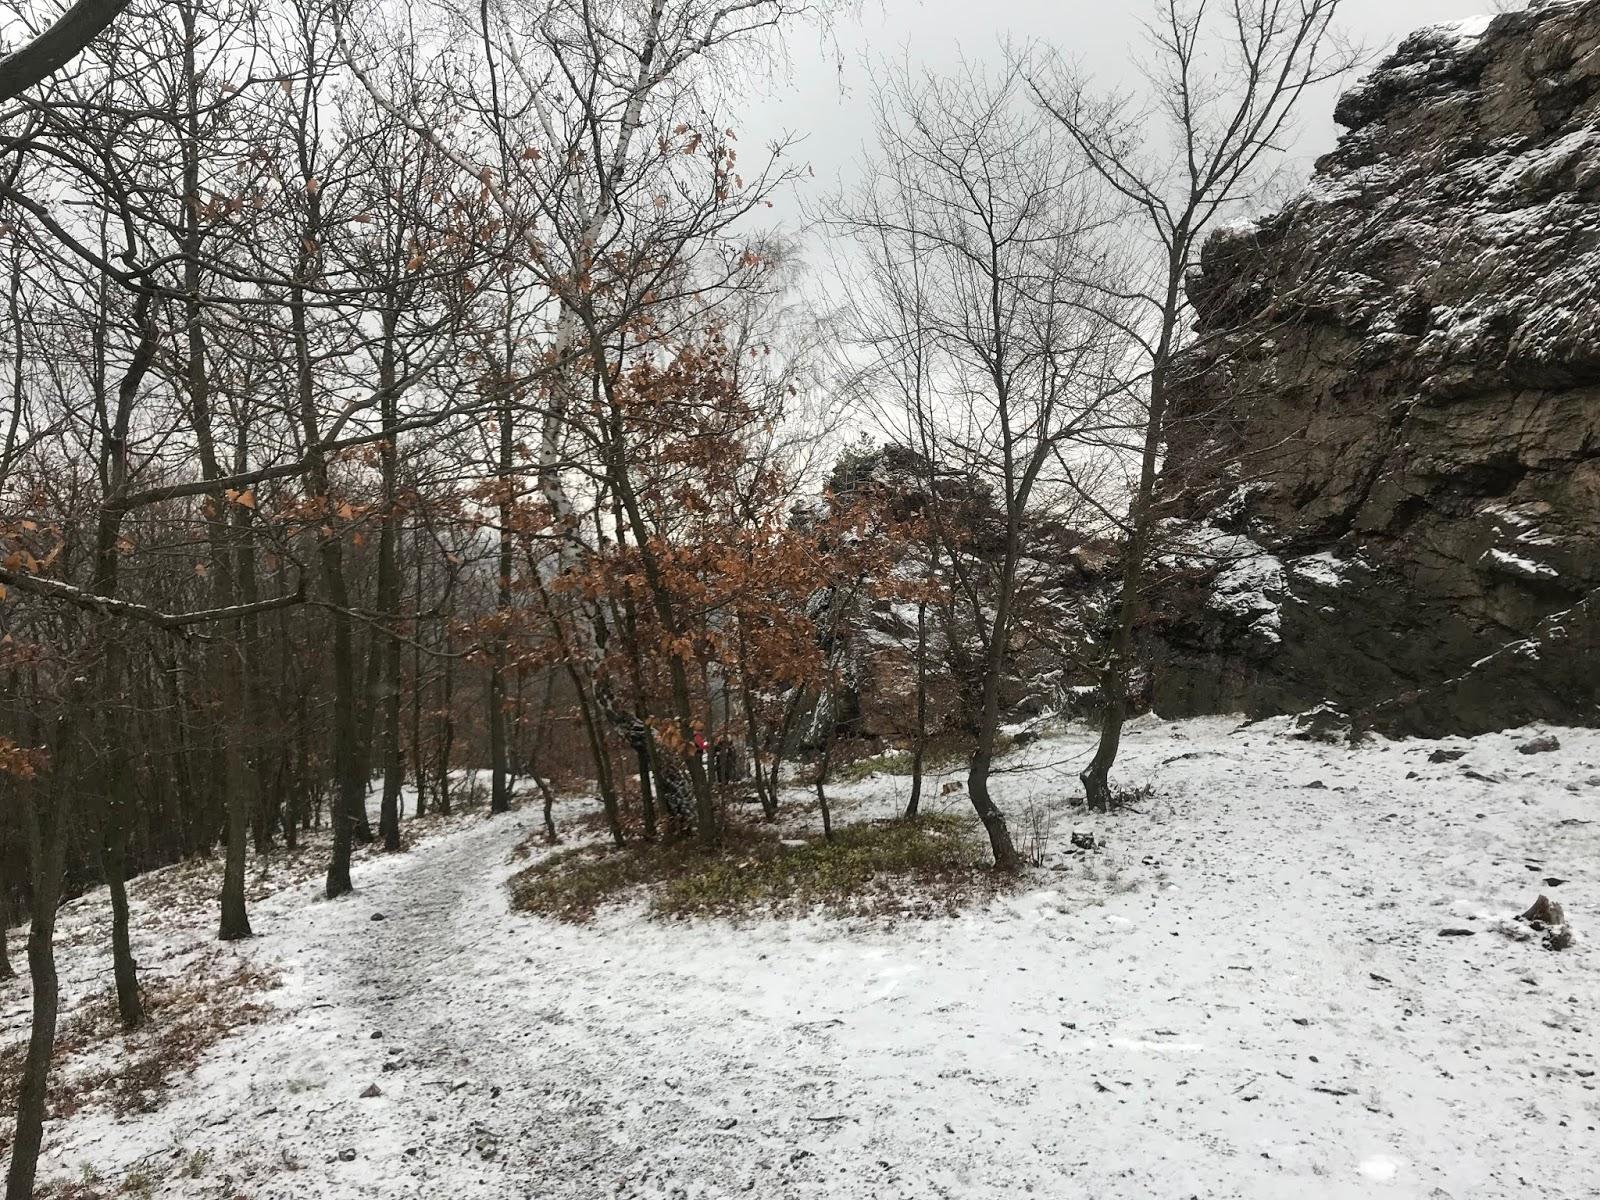 1beeb7b6c Nastastie po par km zase vchadzame do lesa a prichadza stupanie na Karasovu  vyhlidku, v ktorom si mozme oddychnut. Vzdy si pri tomto spomeniem na  Honzu, ...